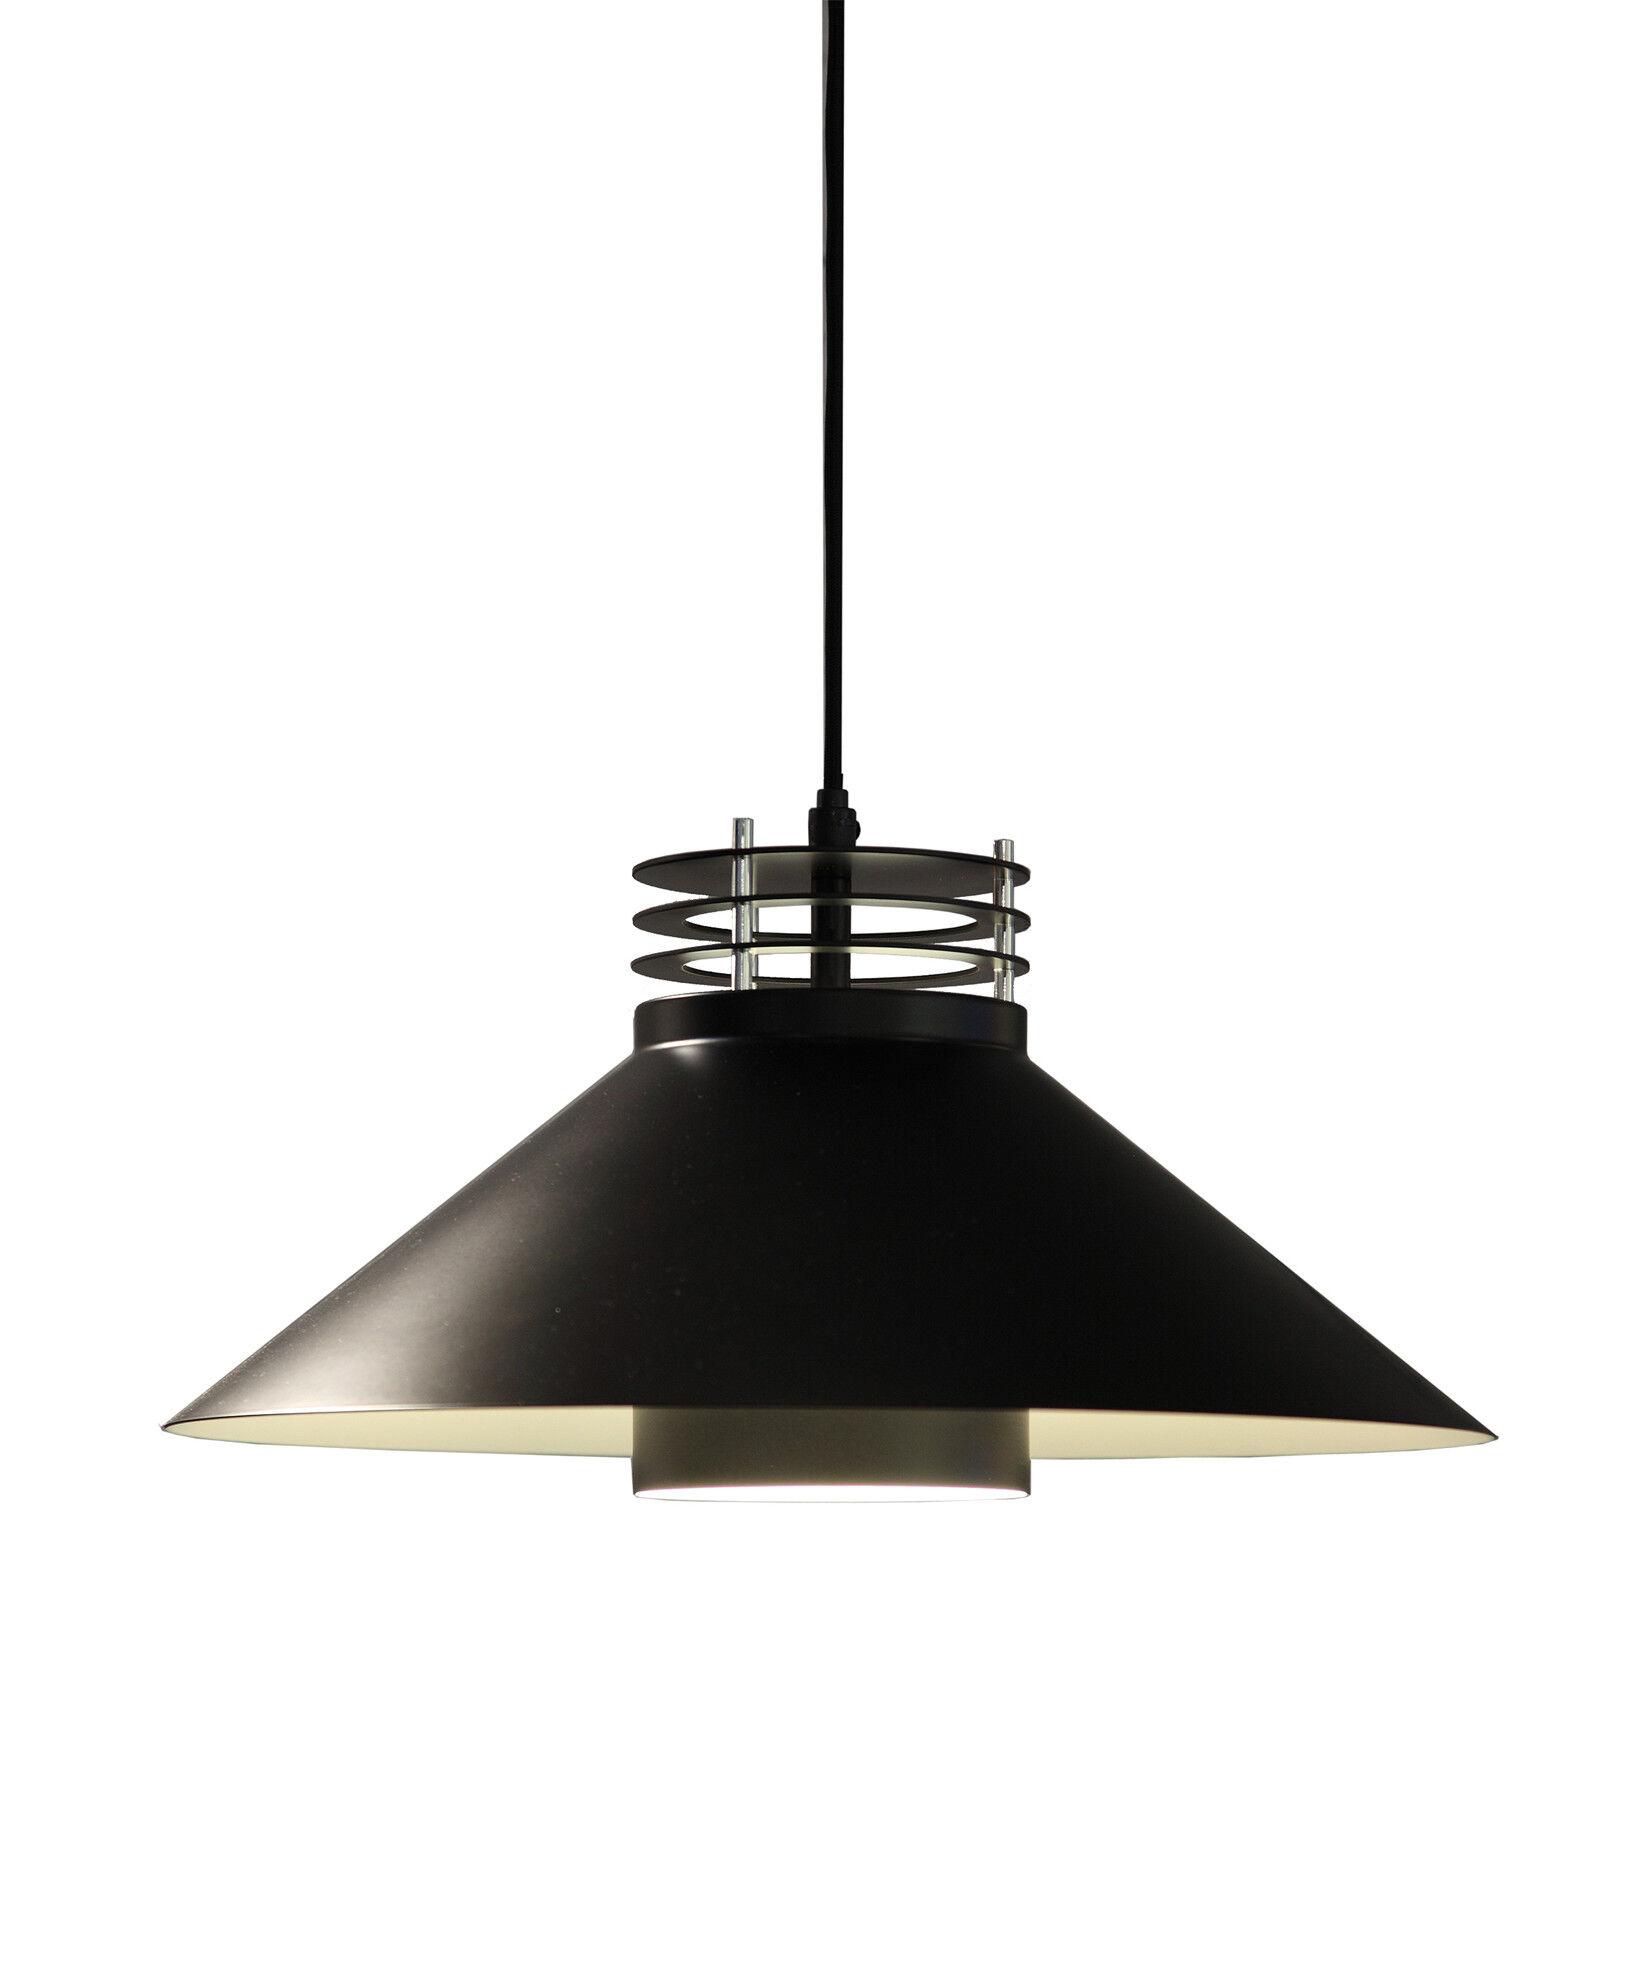 CPH Lighting Basic Riippuvalaisin Musta Ø400 - CPH Lighting